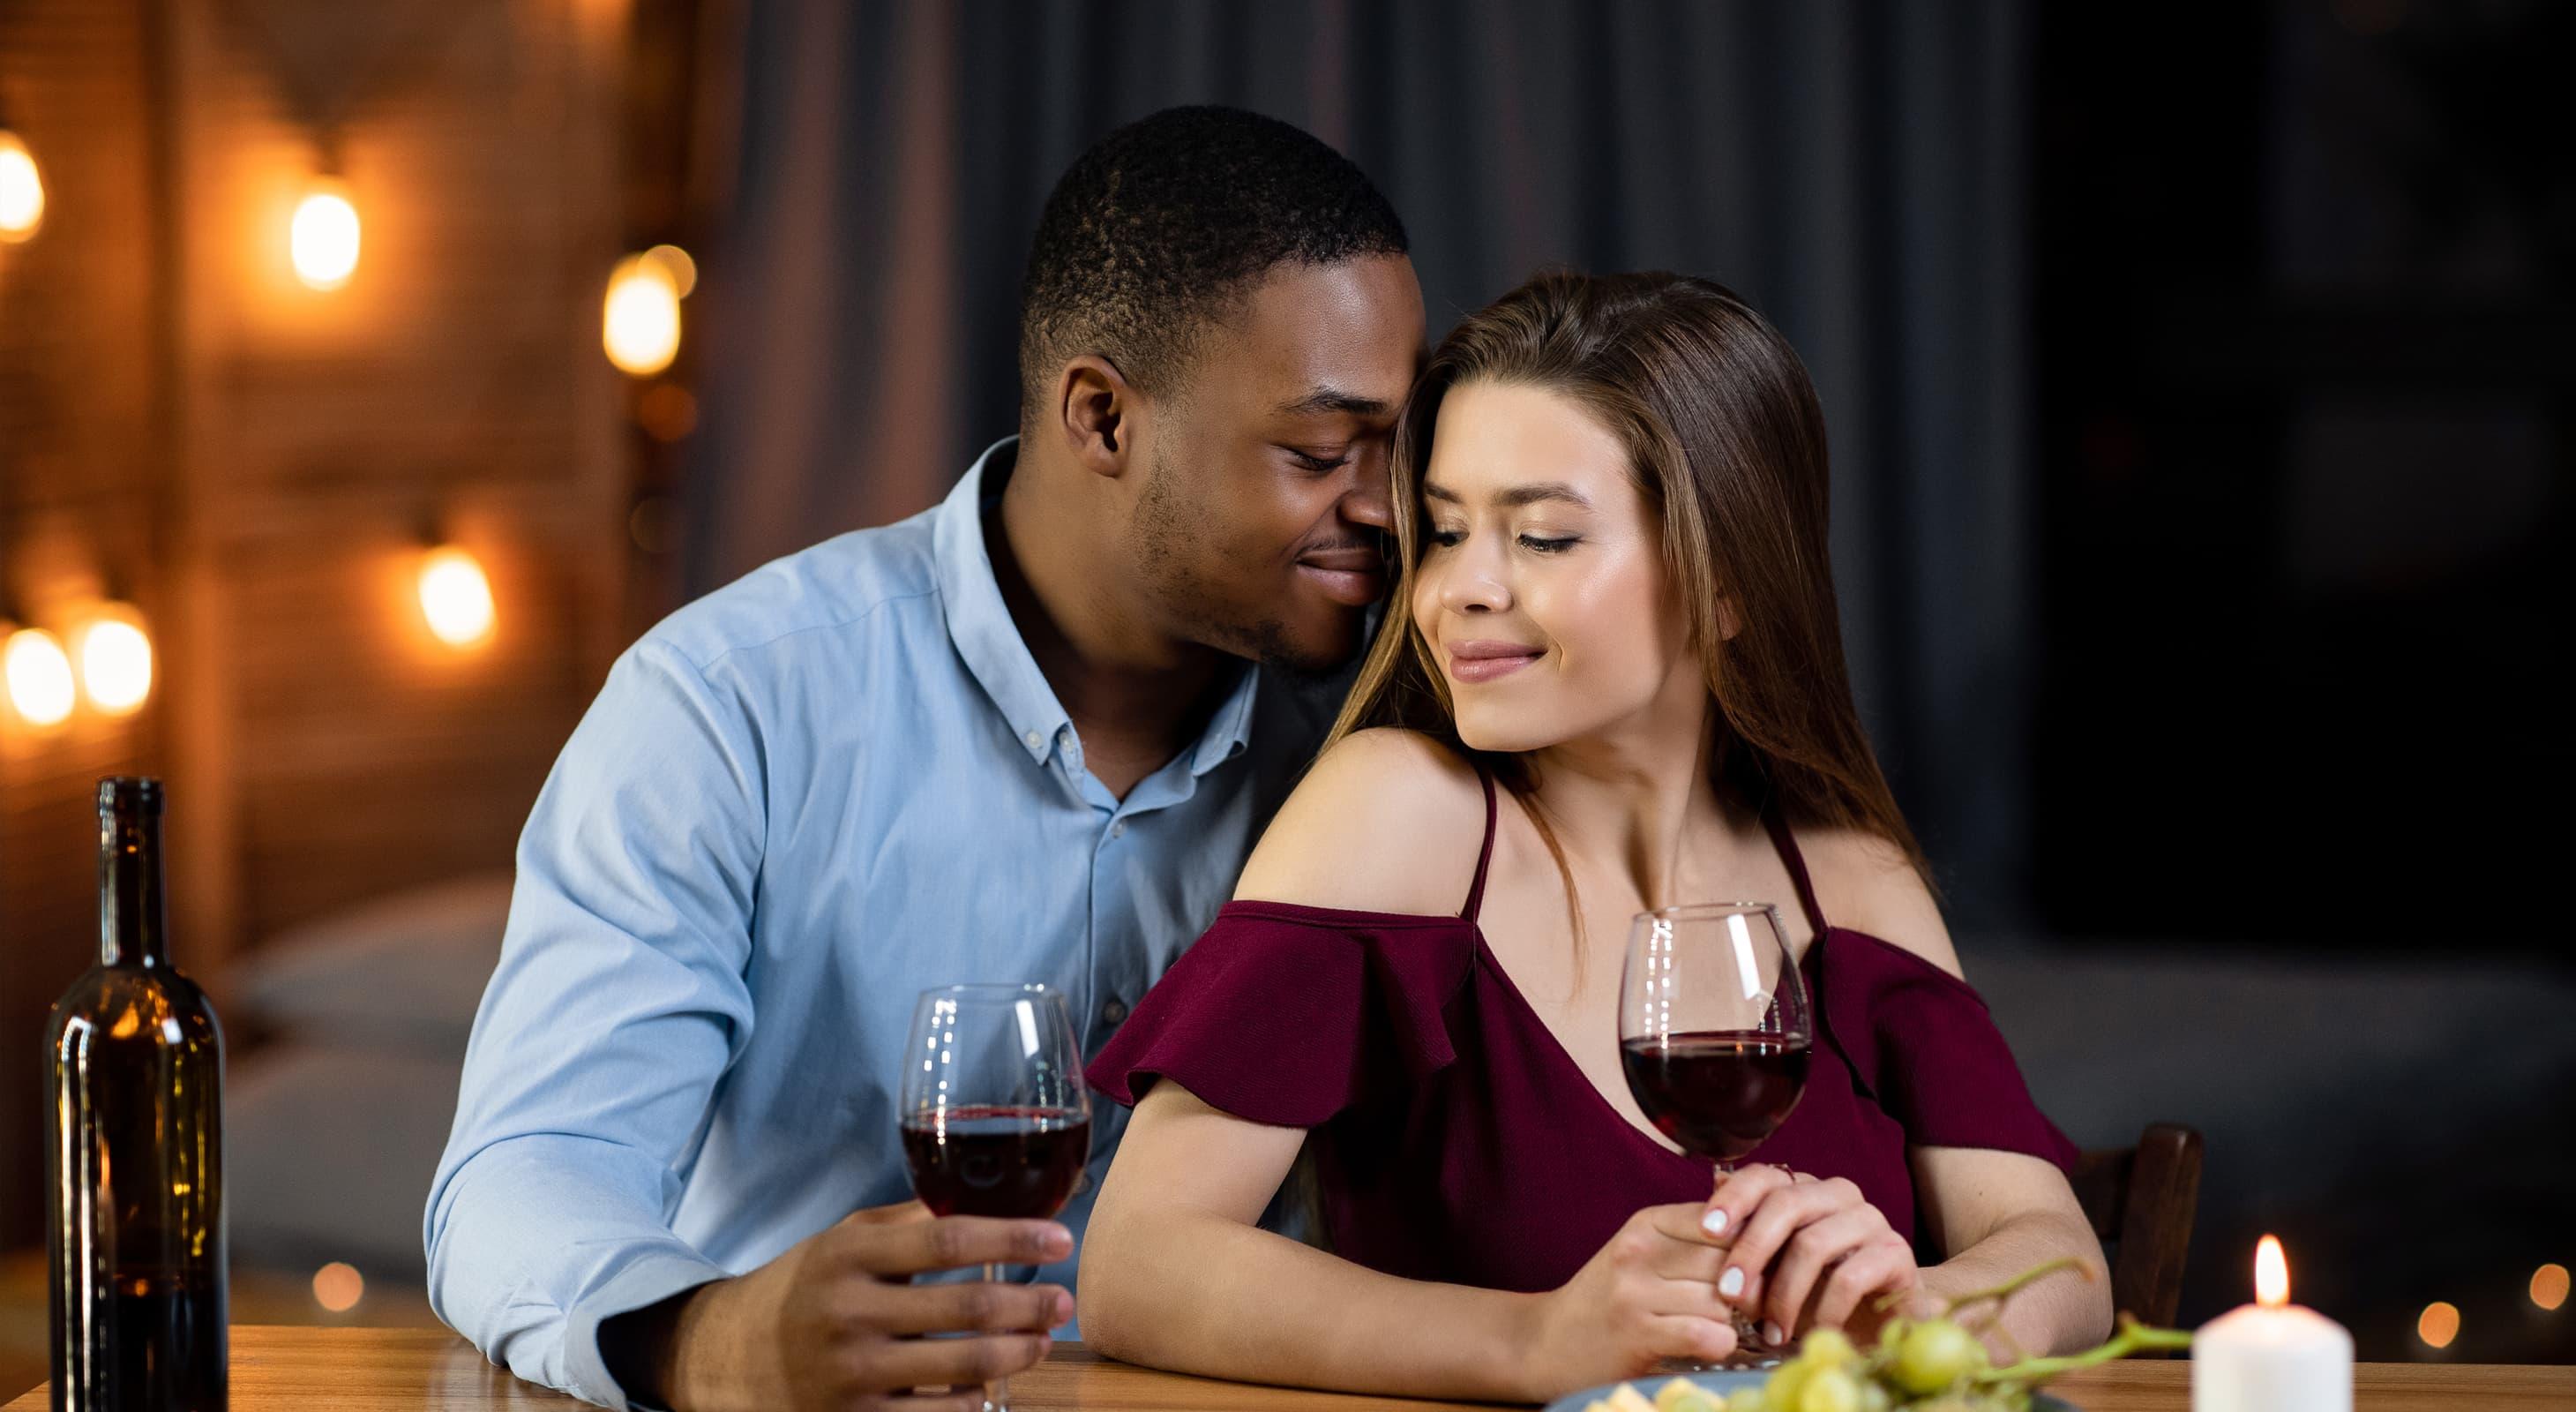 man an woman at romantic dinner